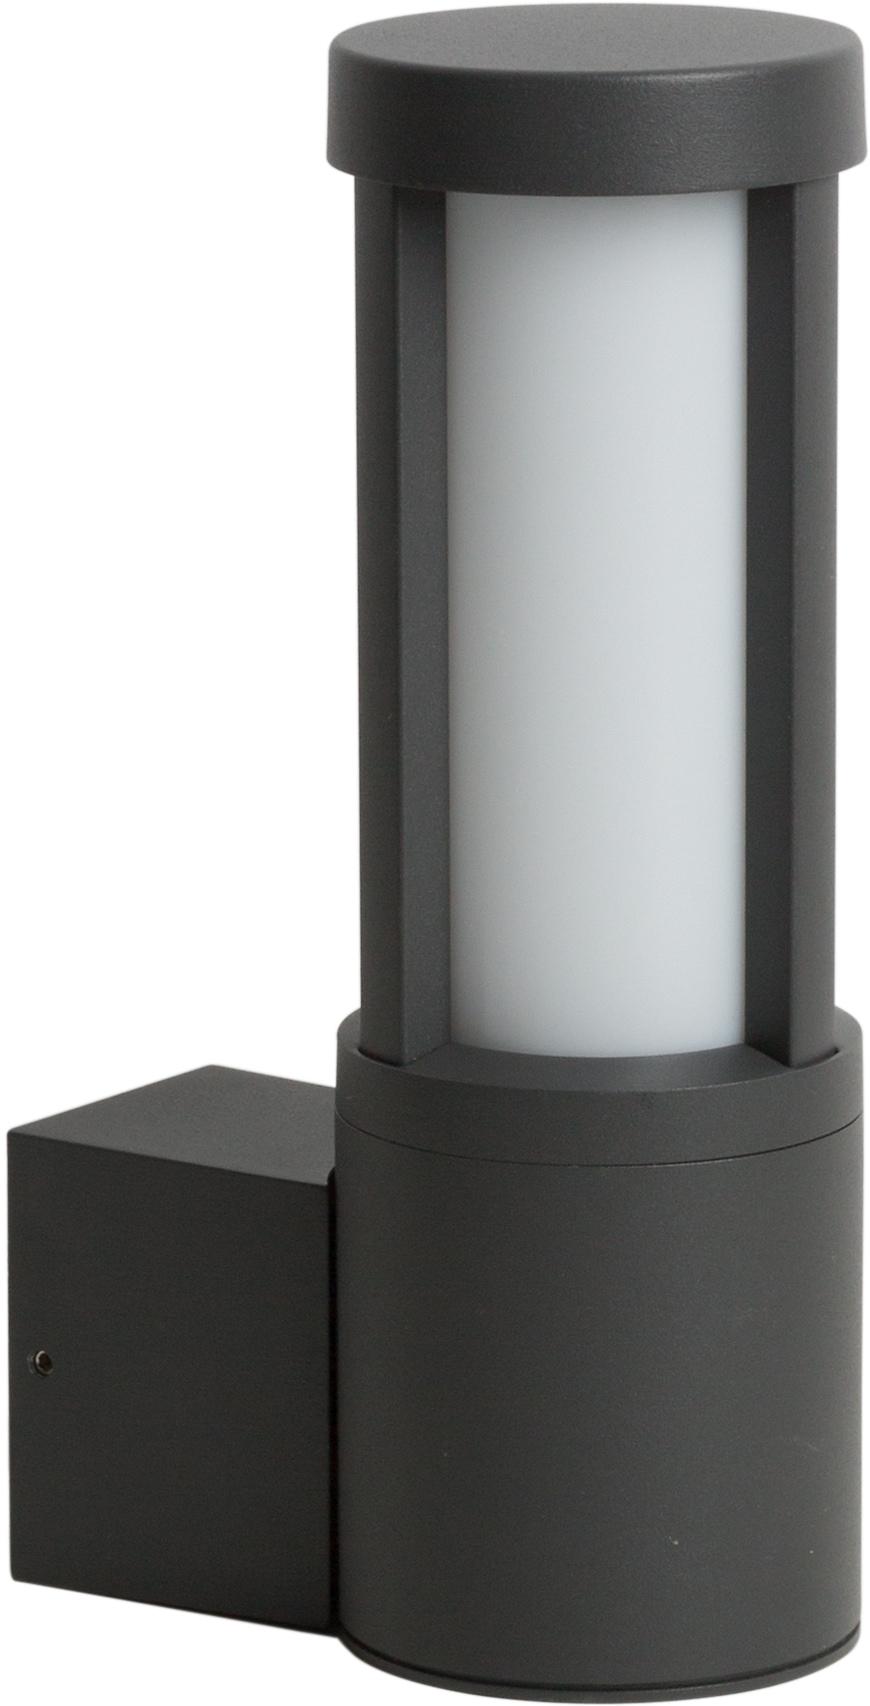 HEITRONIC LED Wandleuchte Palma, LED-Modul, 1 St., Warmweiß, 3 matte Lichtaustrittsflächen